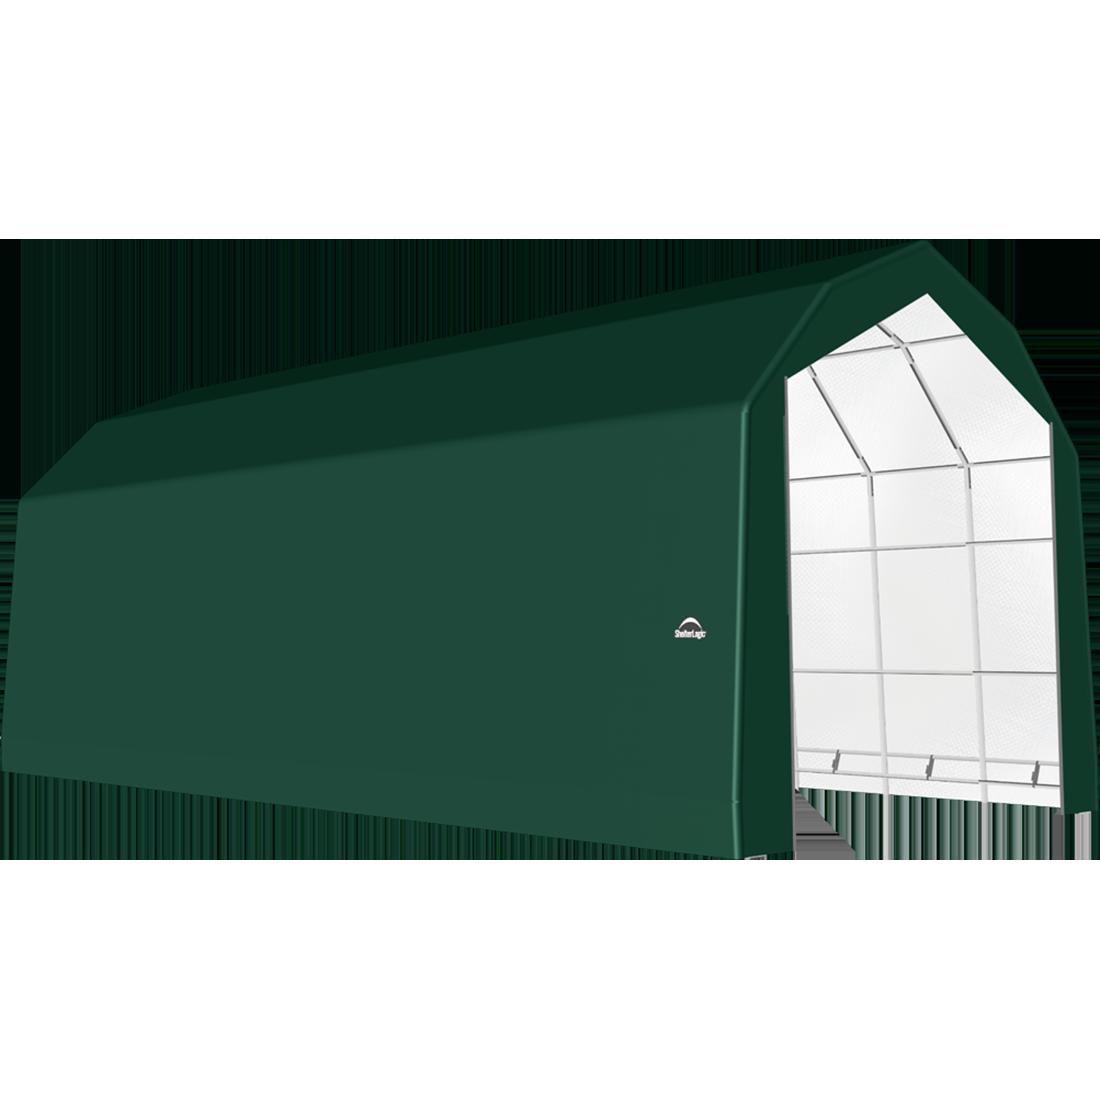 SP Barn 20X44X18 Green 14 oz PE Shelter